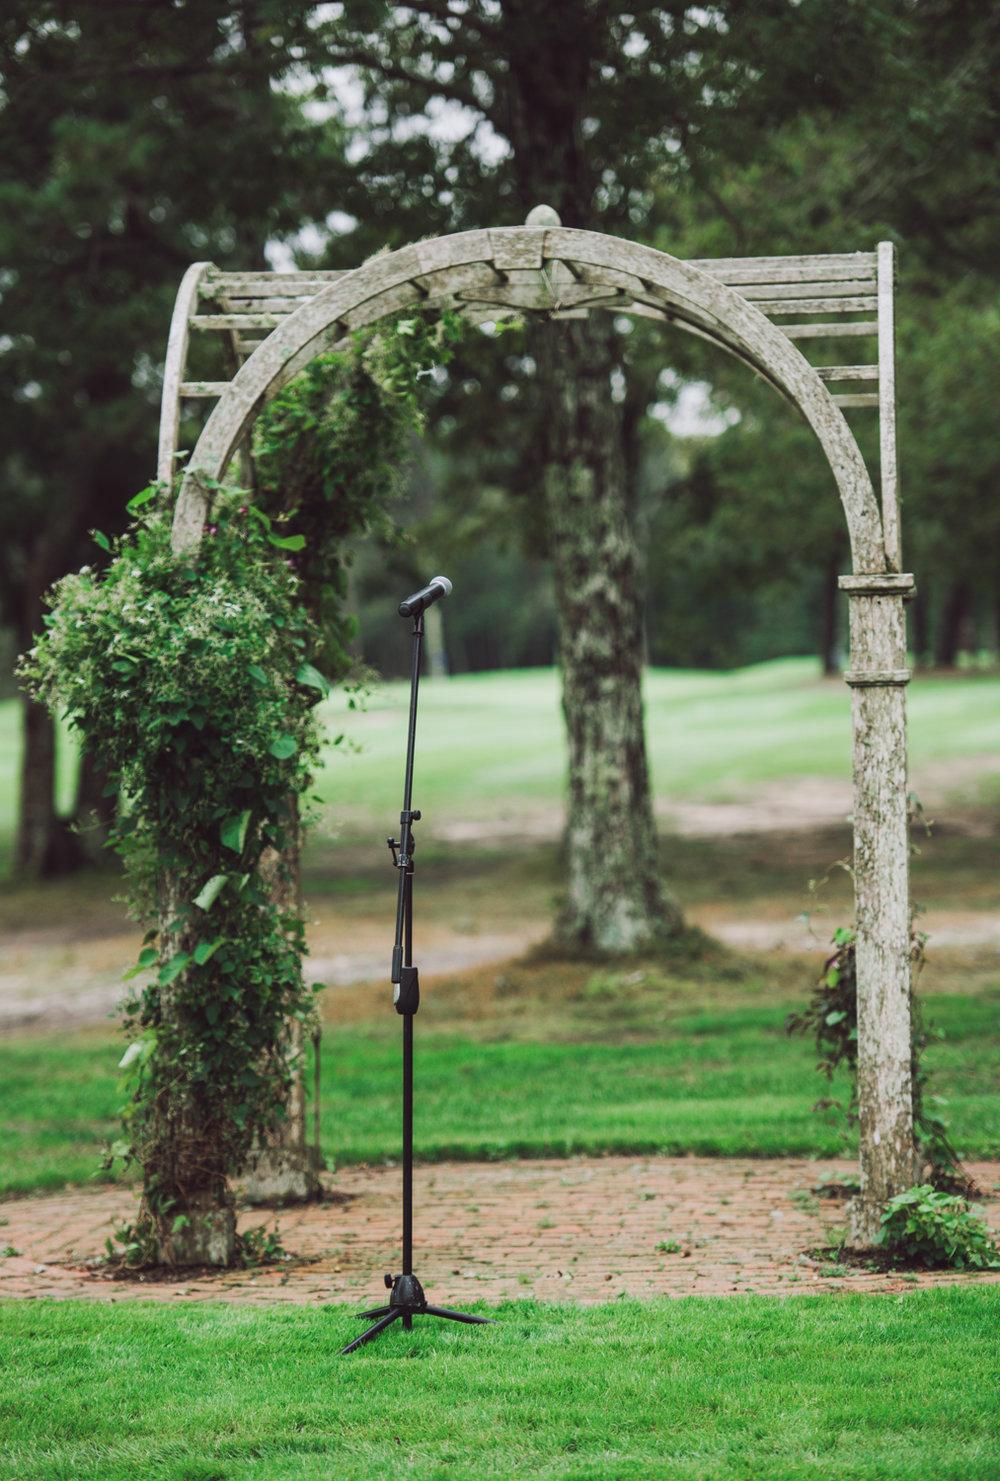 maureen_evan_wedding_marthas_vineyard-9429ceremony_farm_neck_golf_club_ceremony_farm_neck_golf_club.jpg